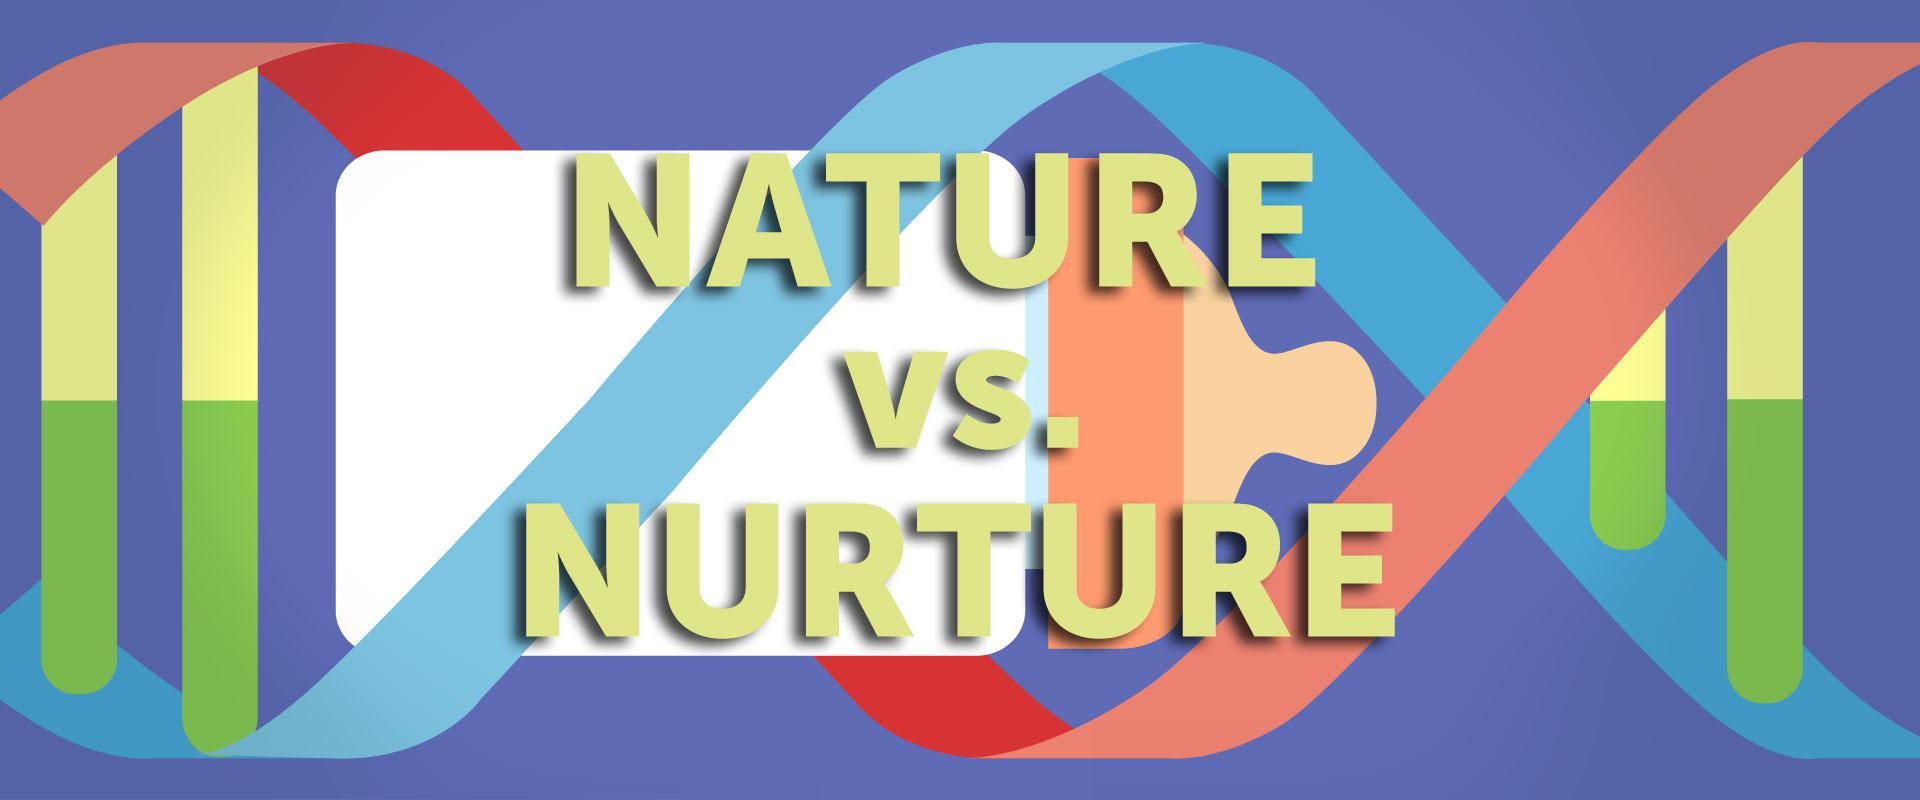 Nature Vs Nurture Science